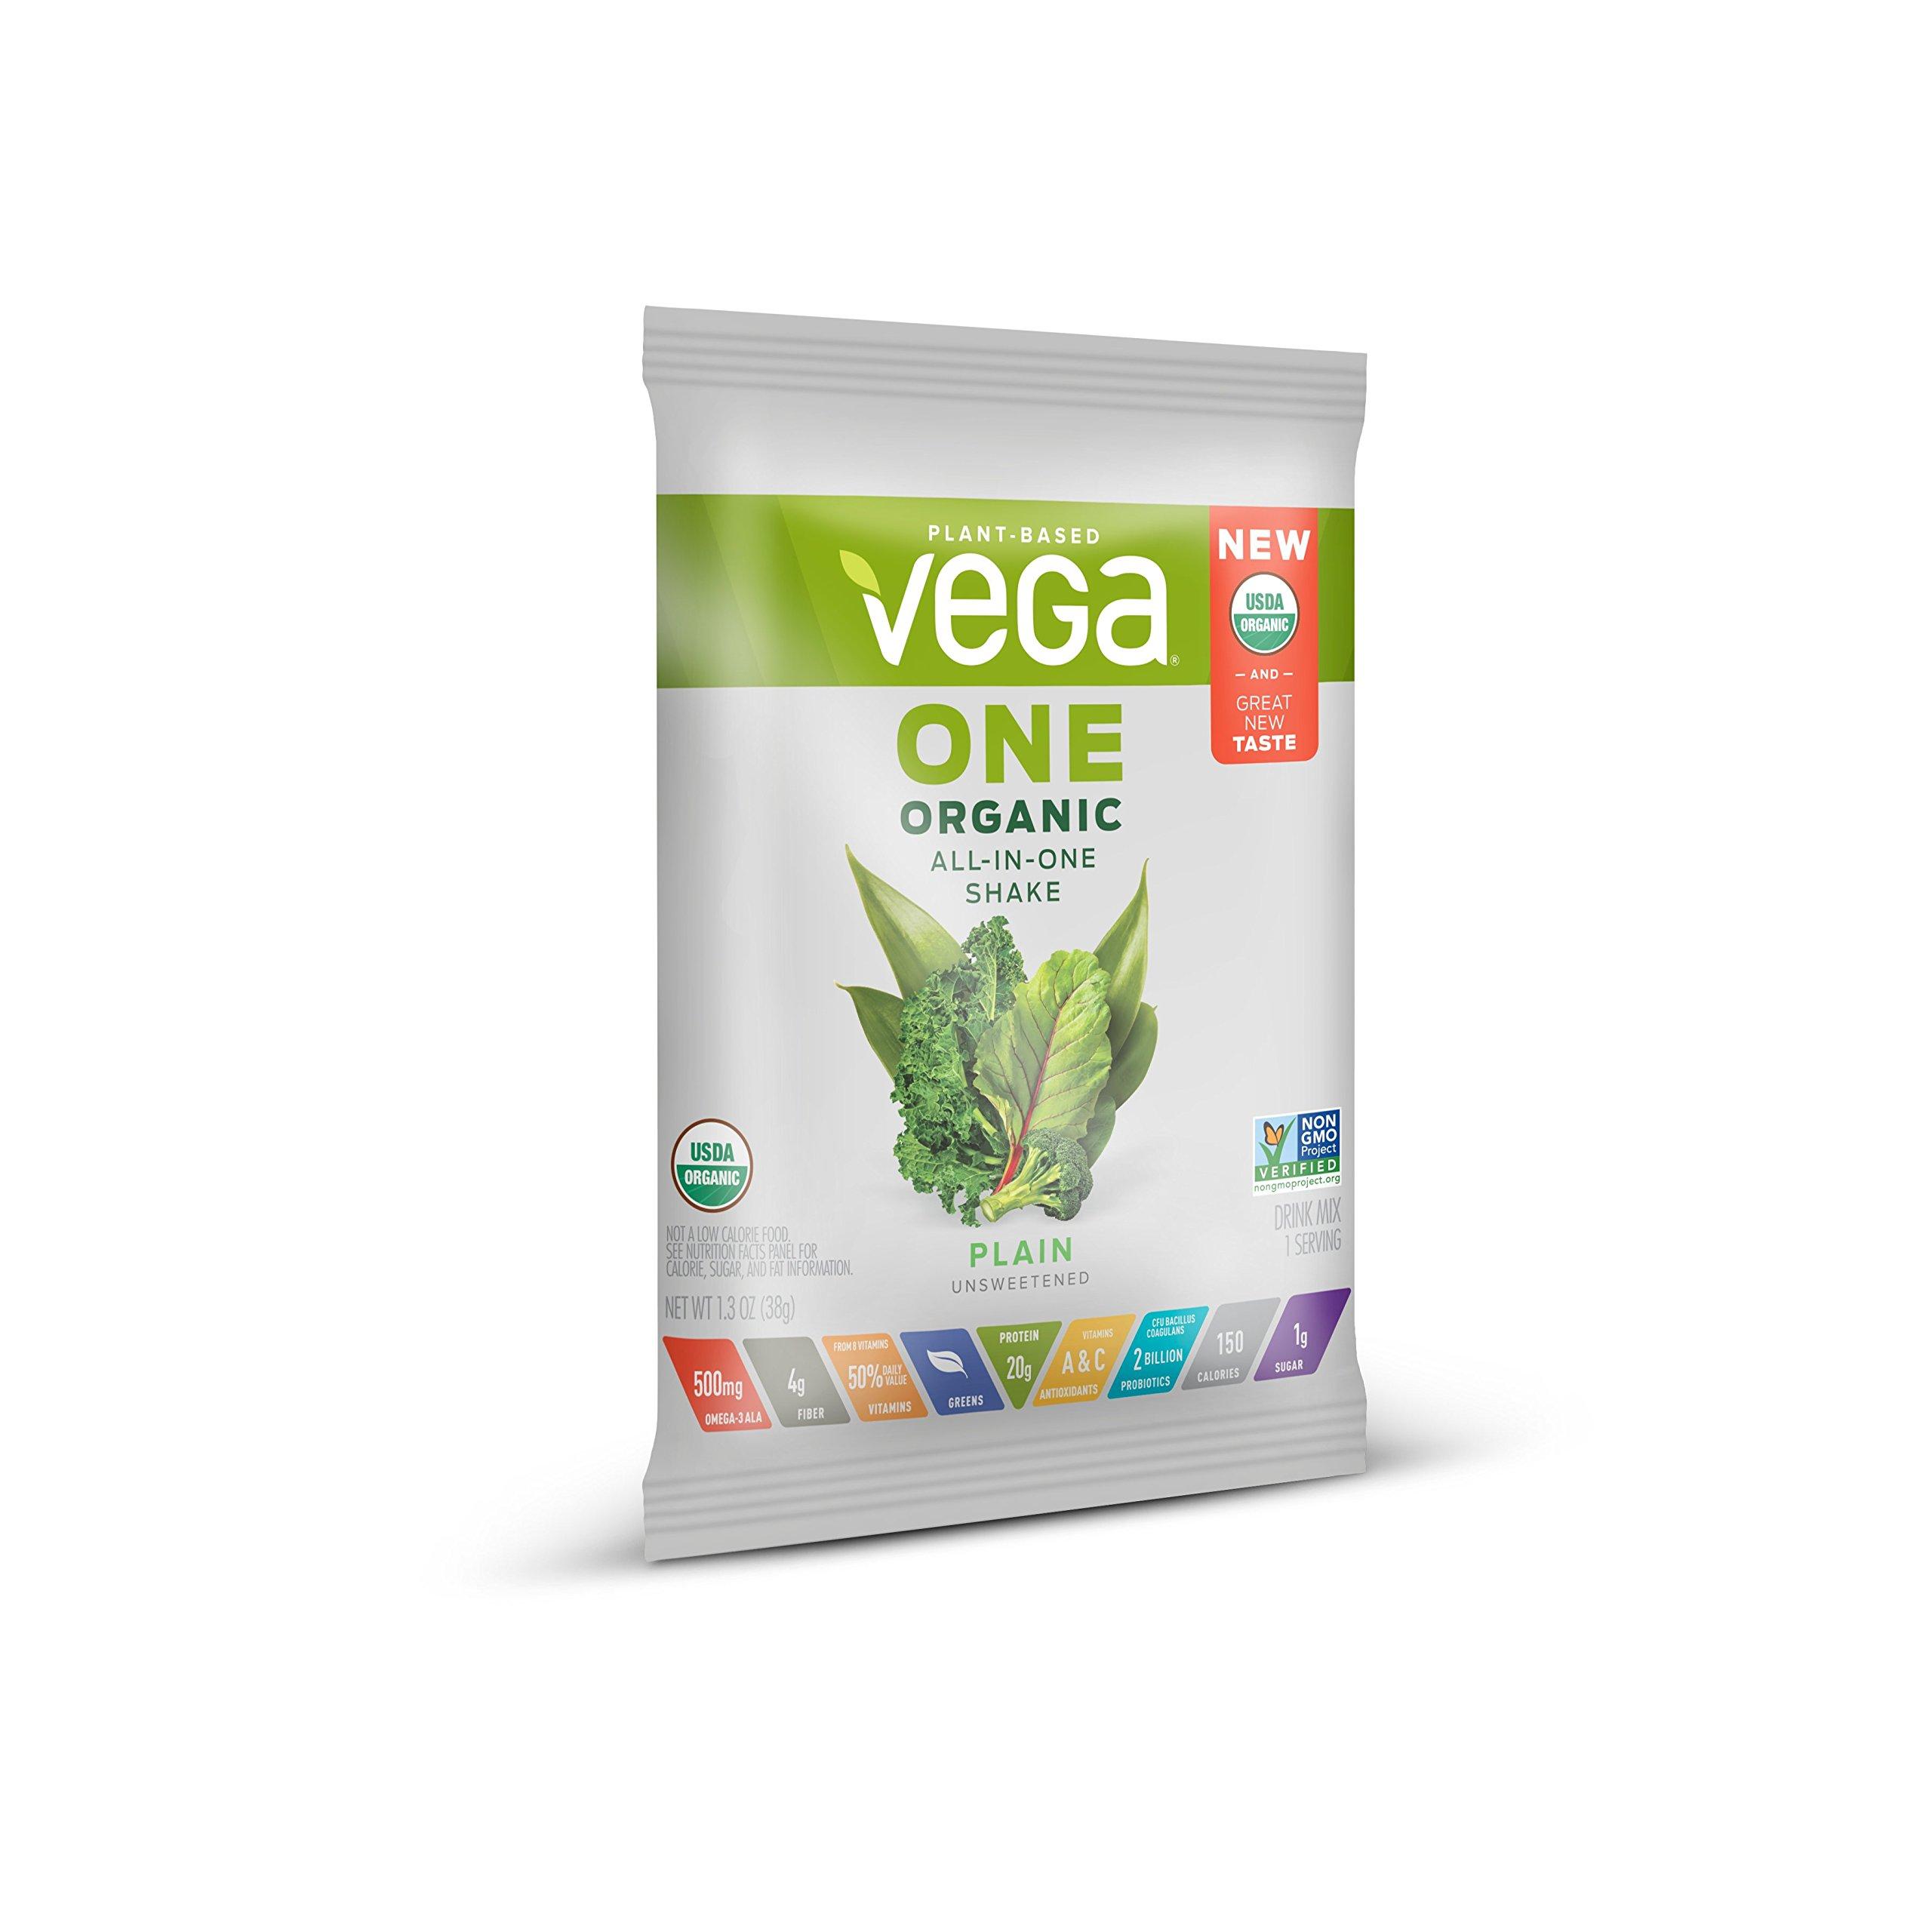 Vega One Organic Plant Protein Powder, Plain Unsweetened, 1.4 Ounce